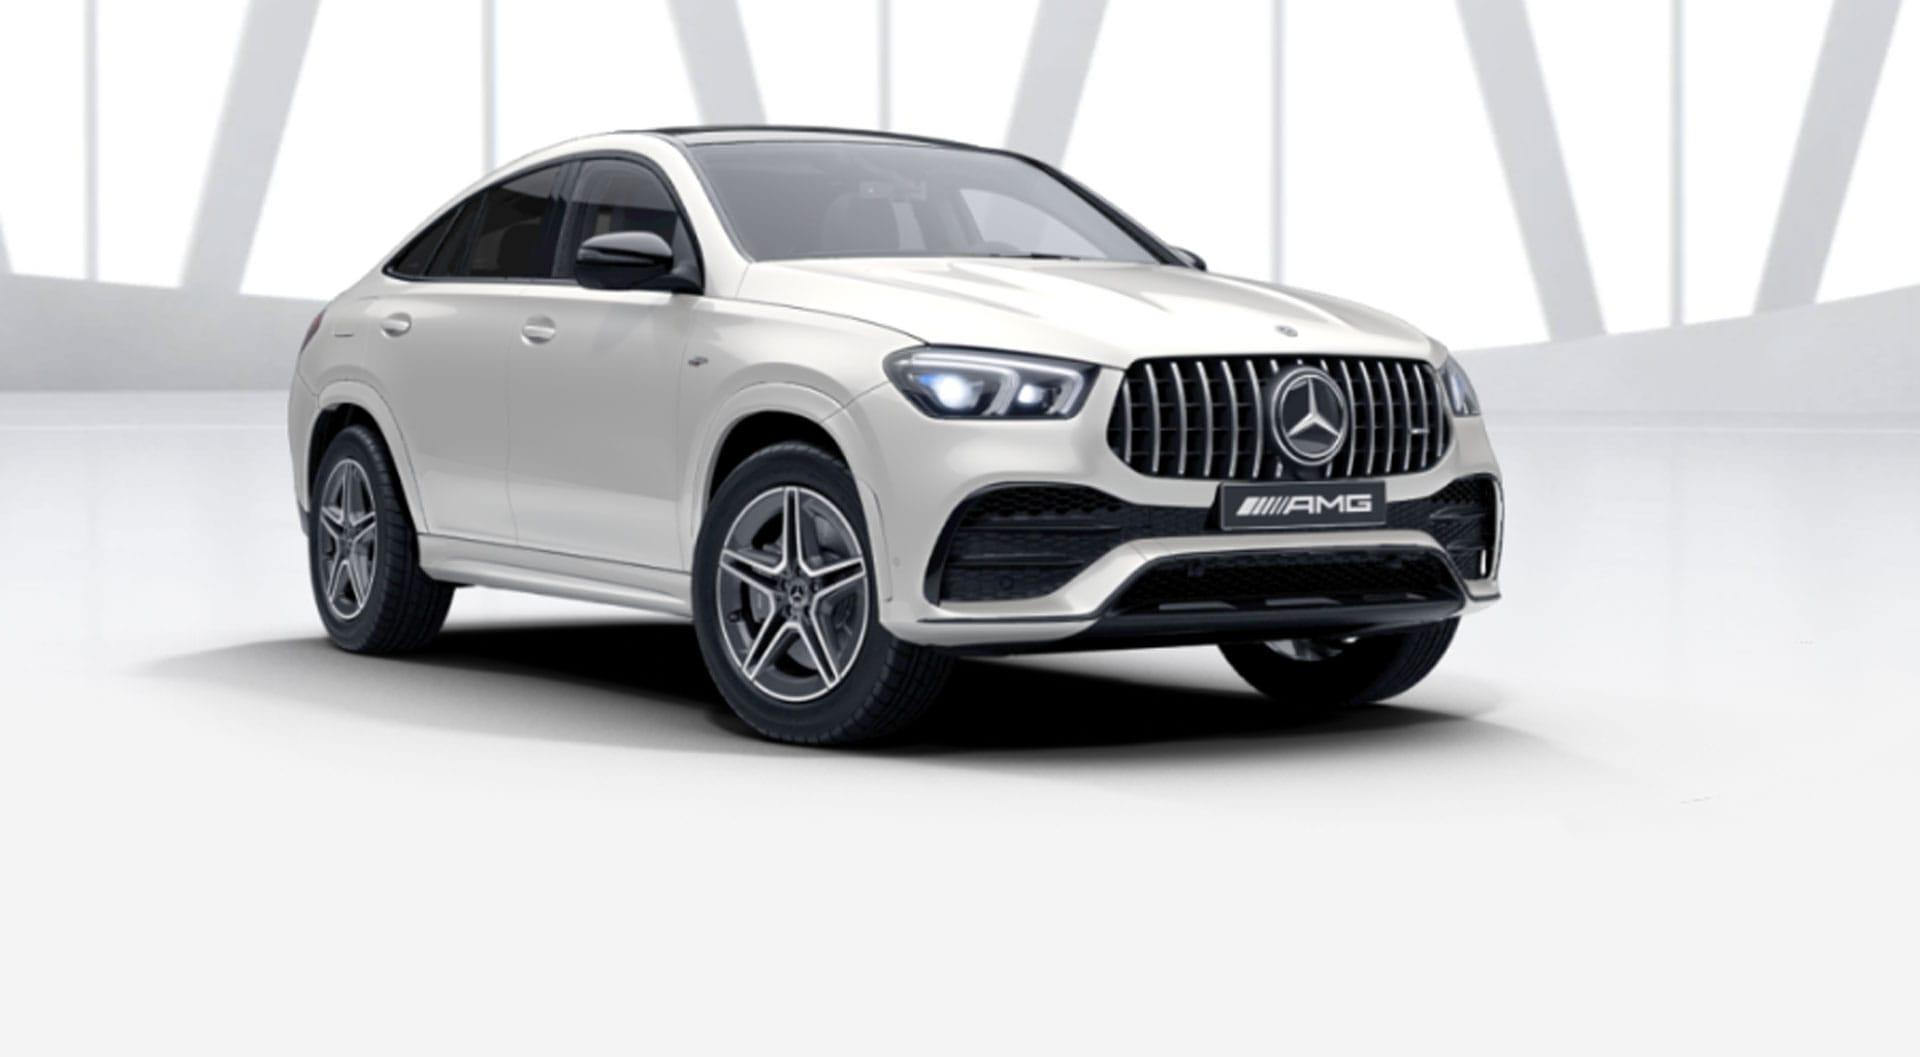 Mercedes-AMG GLE Coupe 0152600461